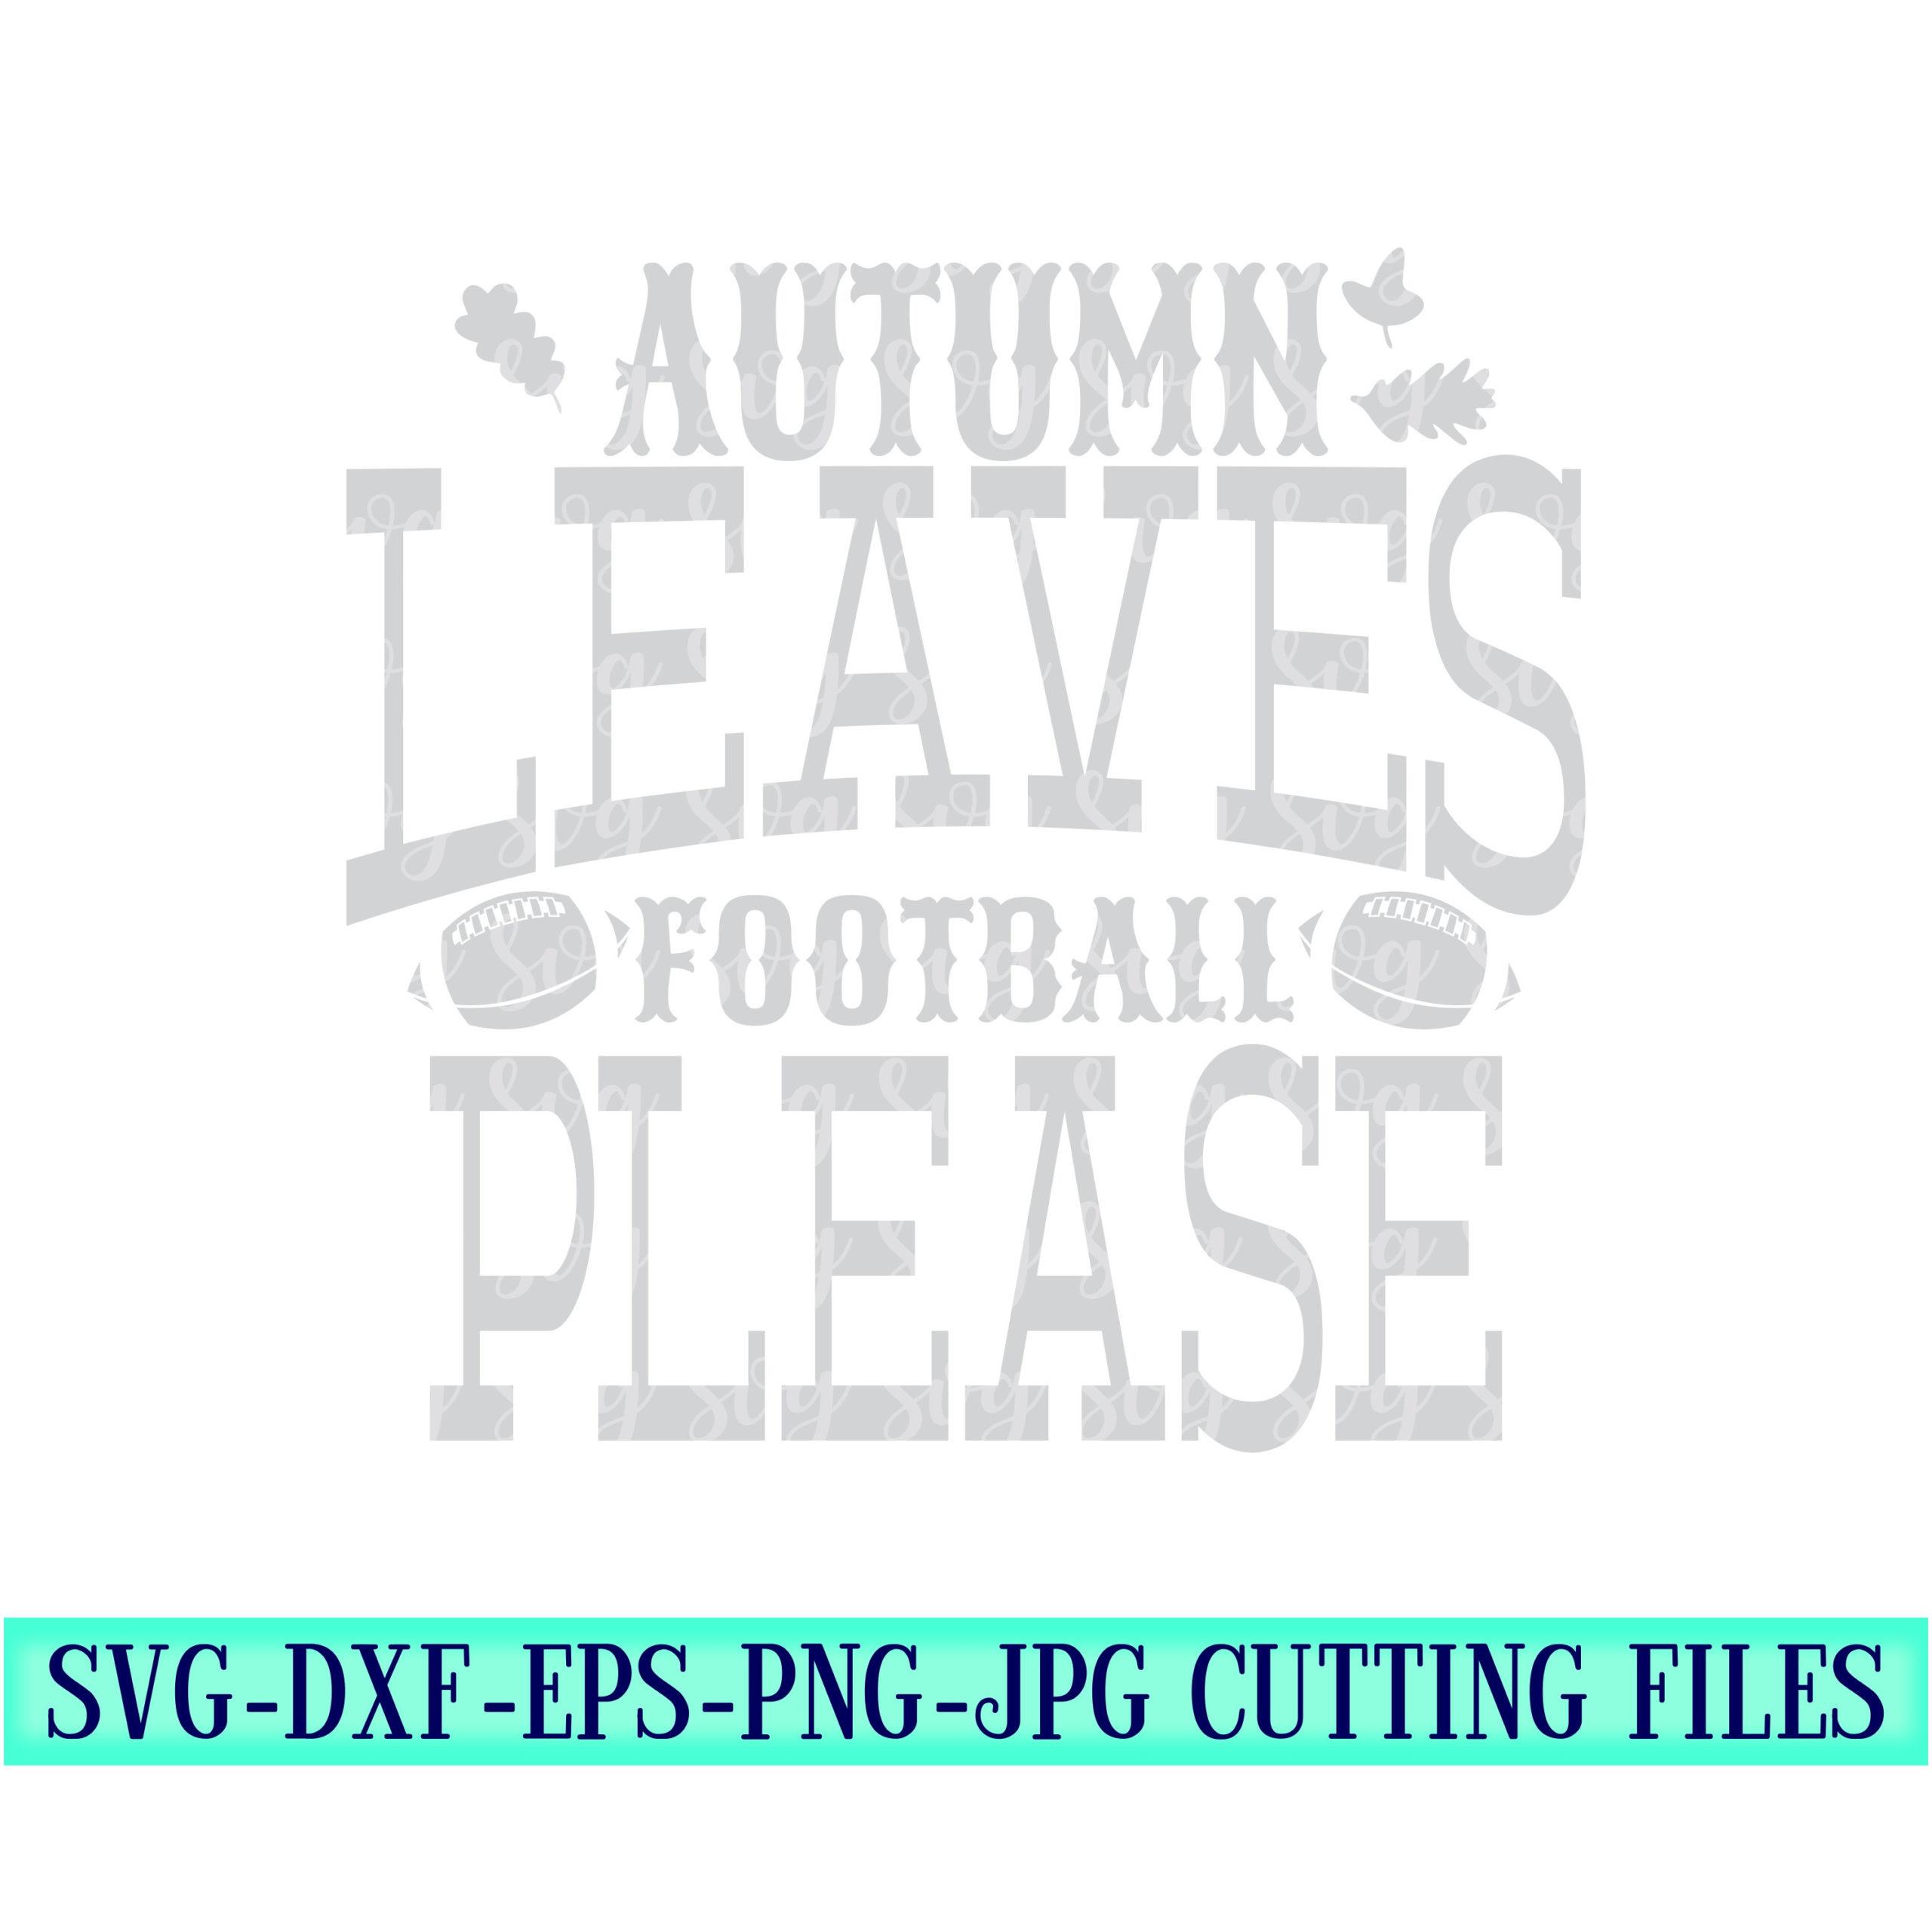 Autumn-leaves-svg-football-svg-football-please-svg-fall-svg-pumpkins-svg-sweater-weather-svg-fall-svg-designcricut-svgsvg-for-mobile-5f6f7122